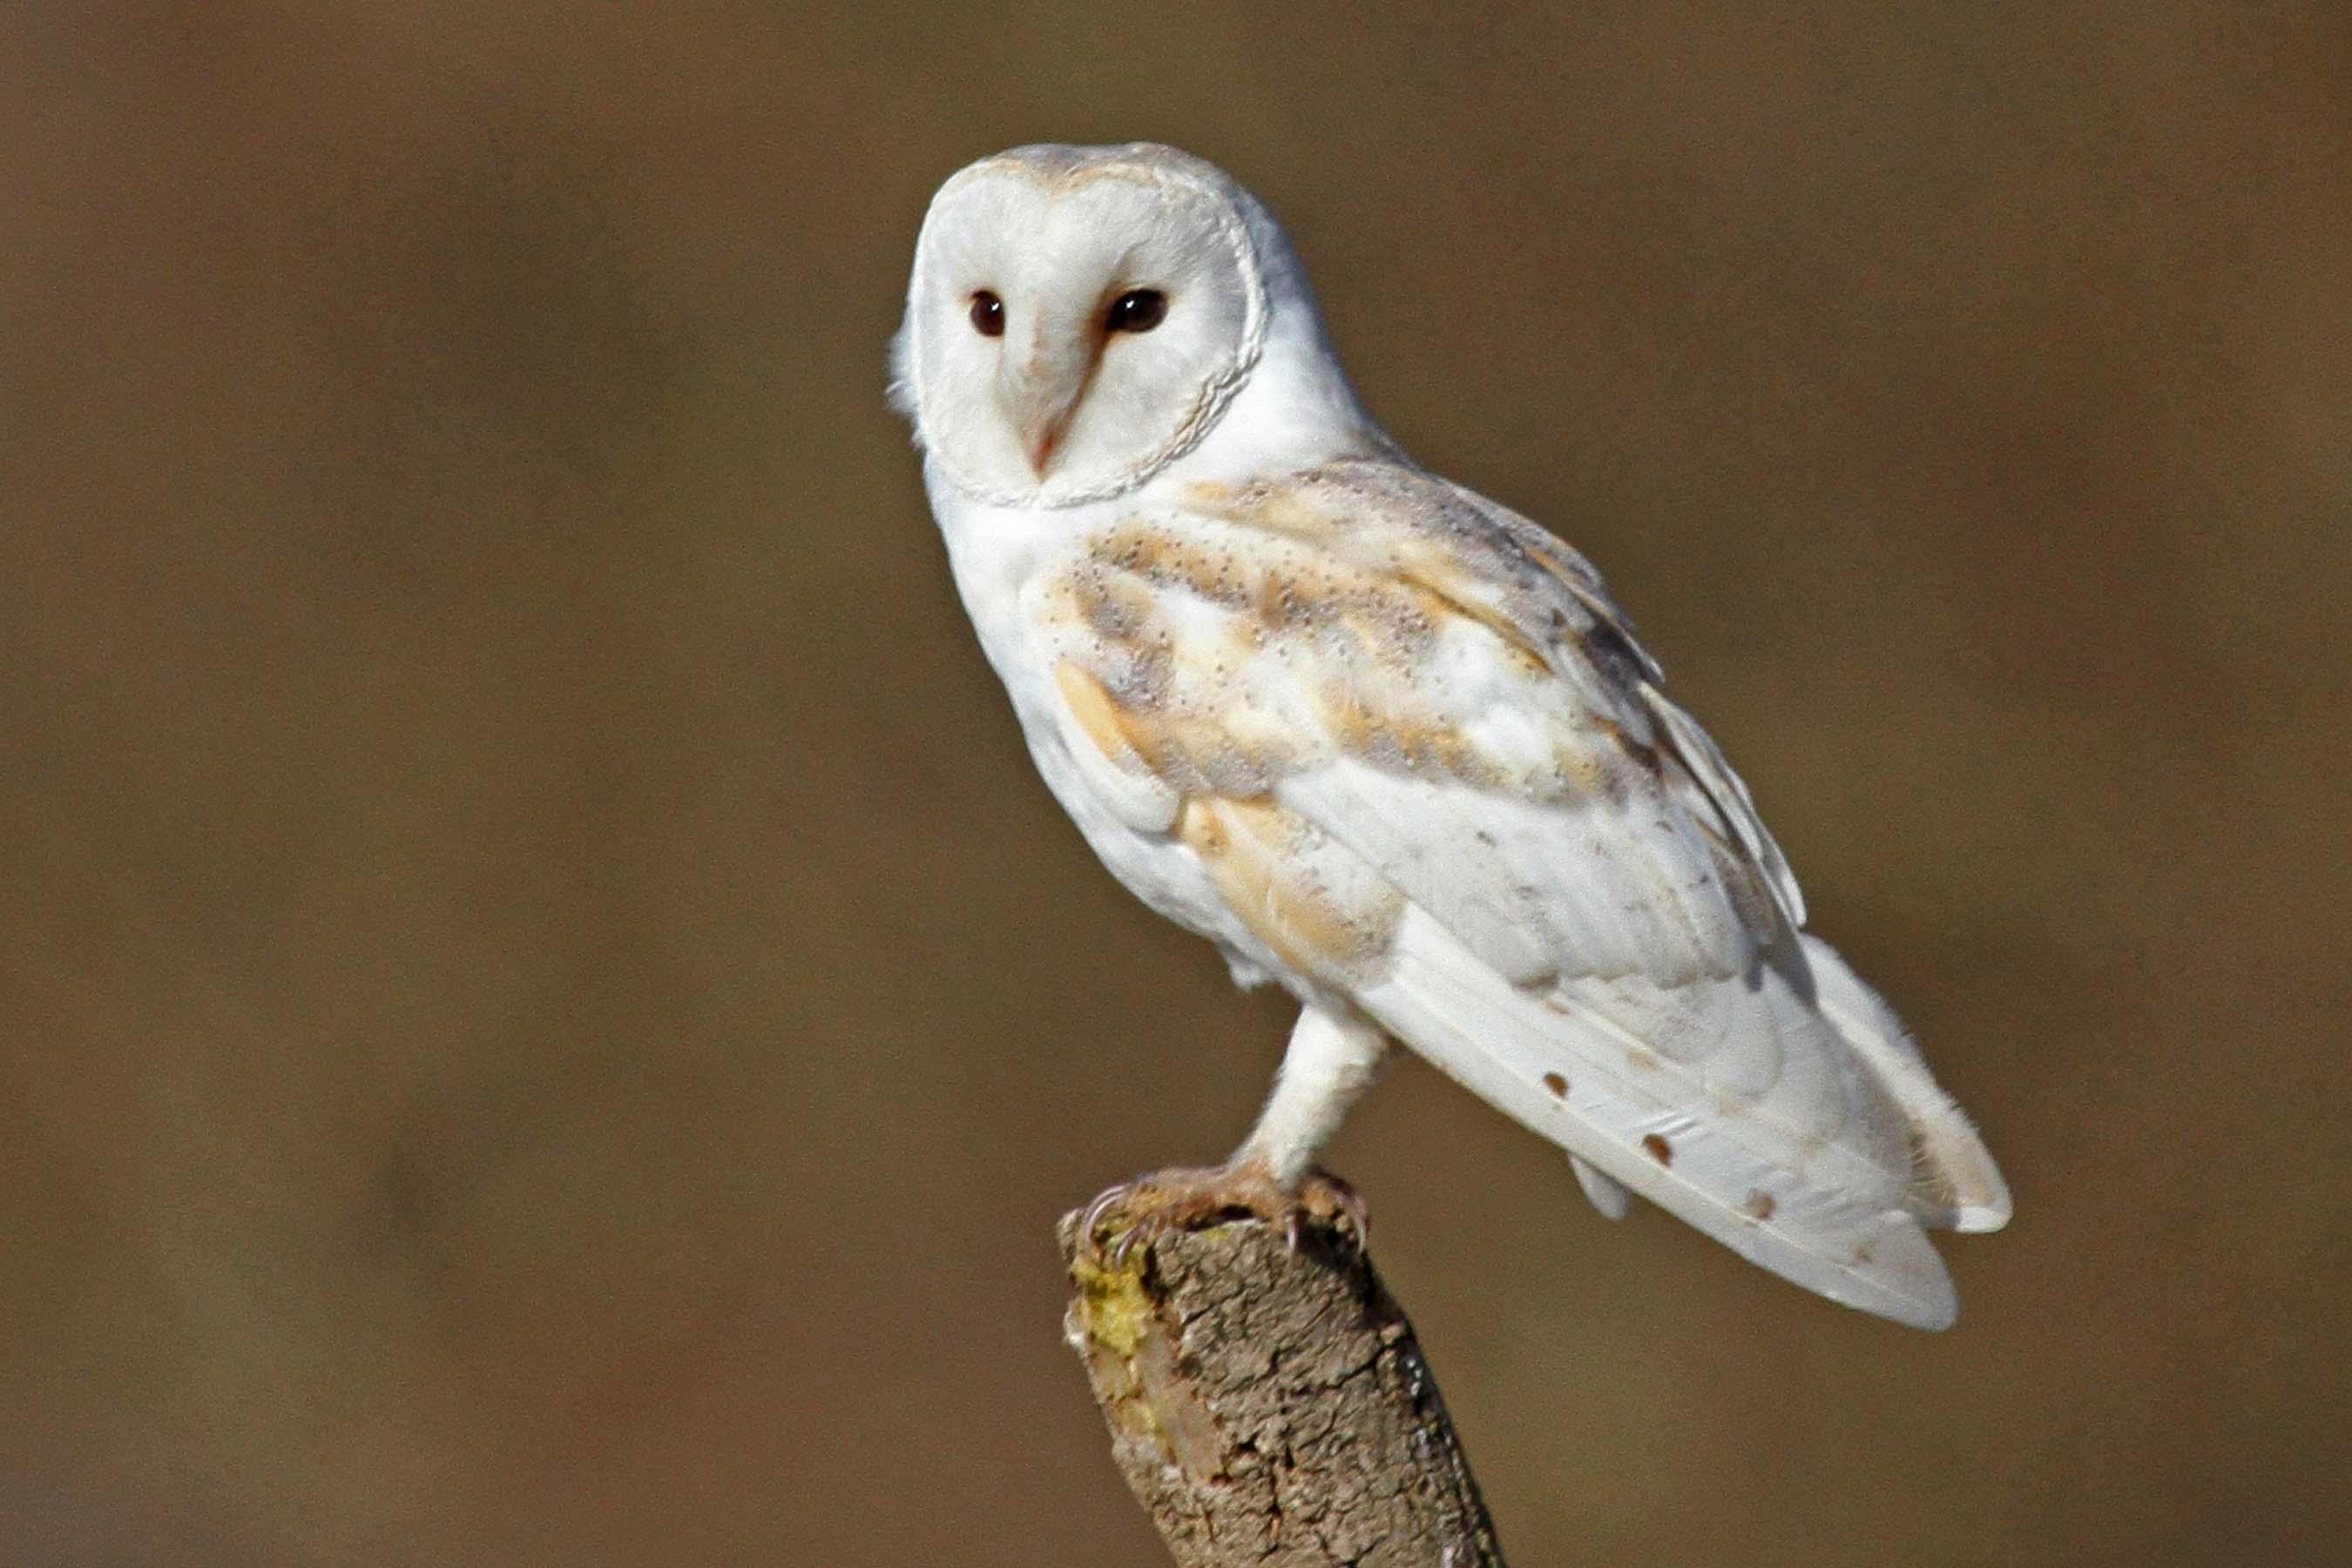 Free Hd Cute Baby Wallpaper Barn Owl Delight Moorland Association